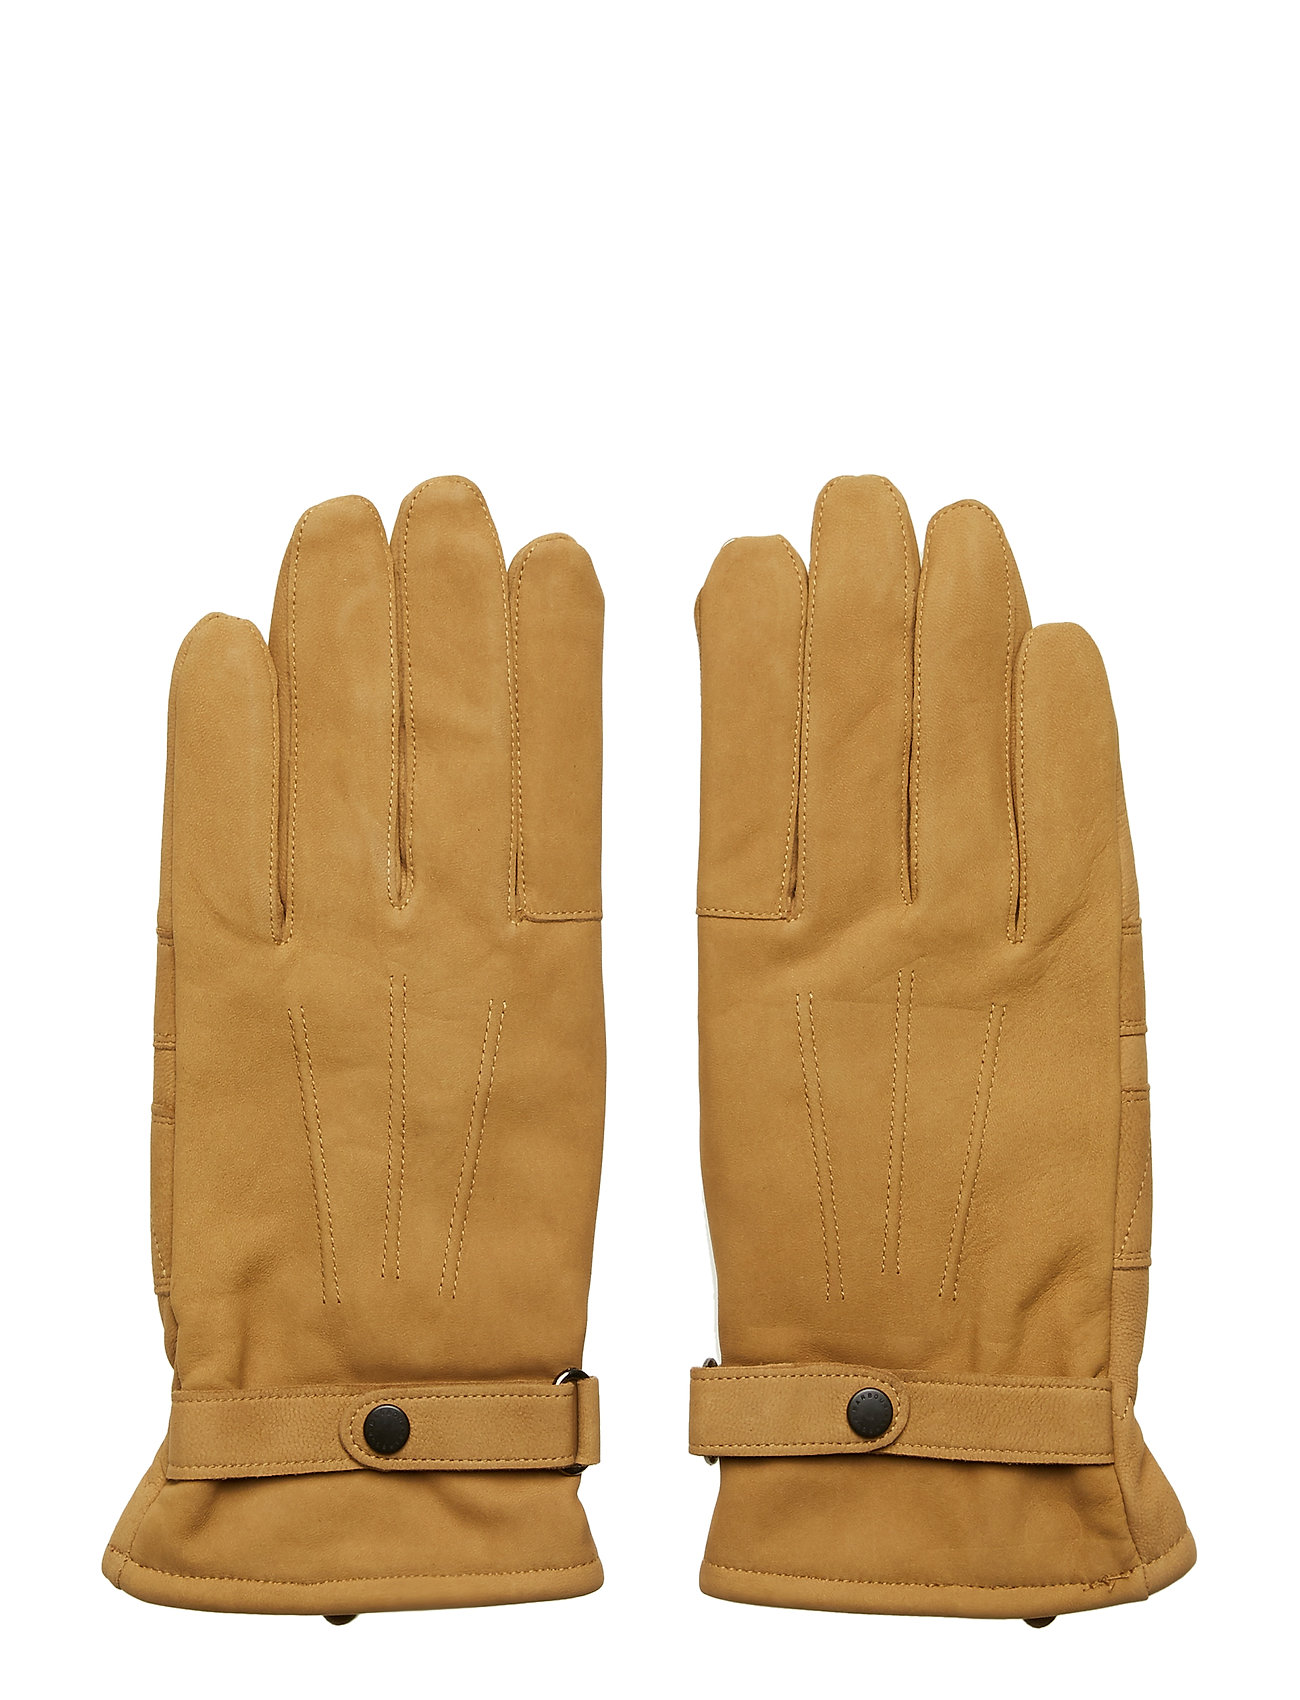 Barbour Leather Thinsulate Gloves Handsker Brun Barbour